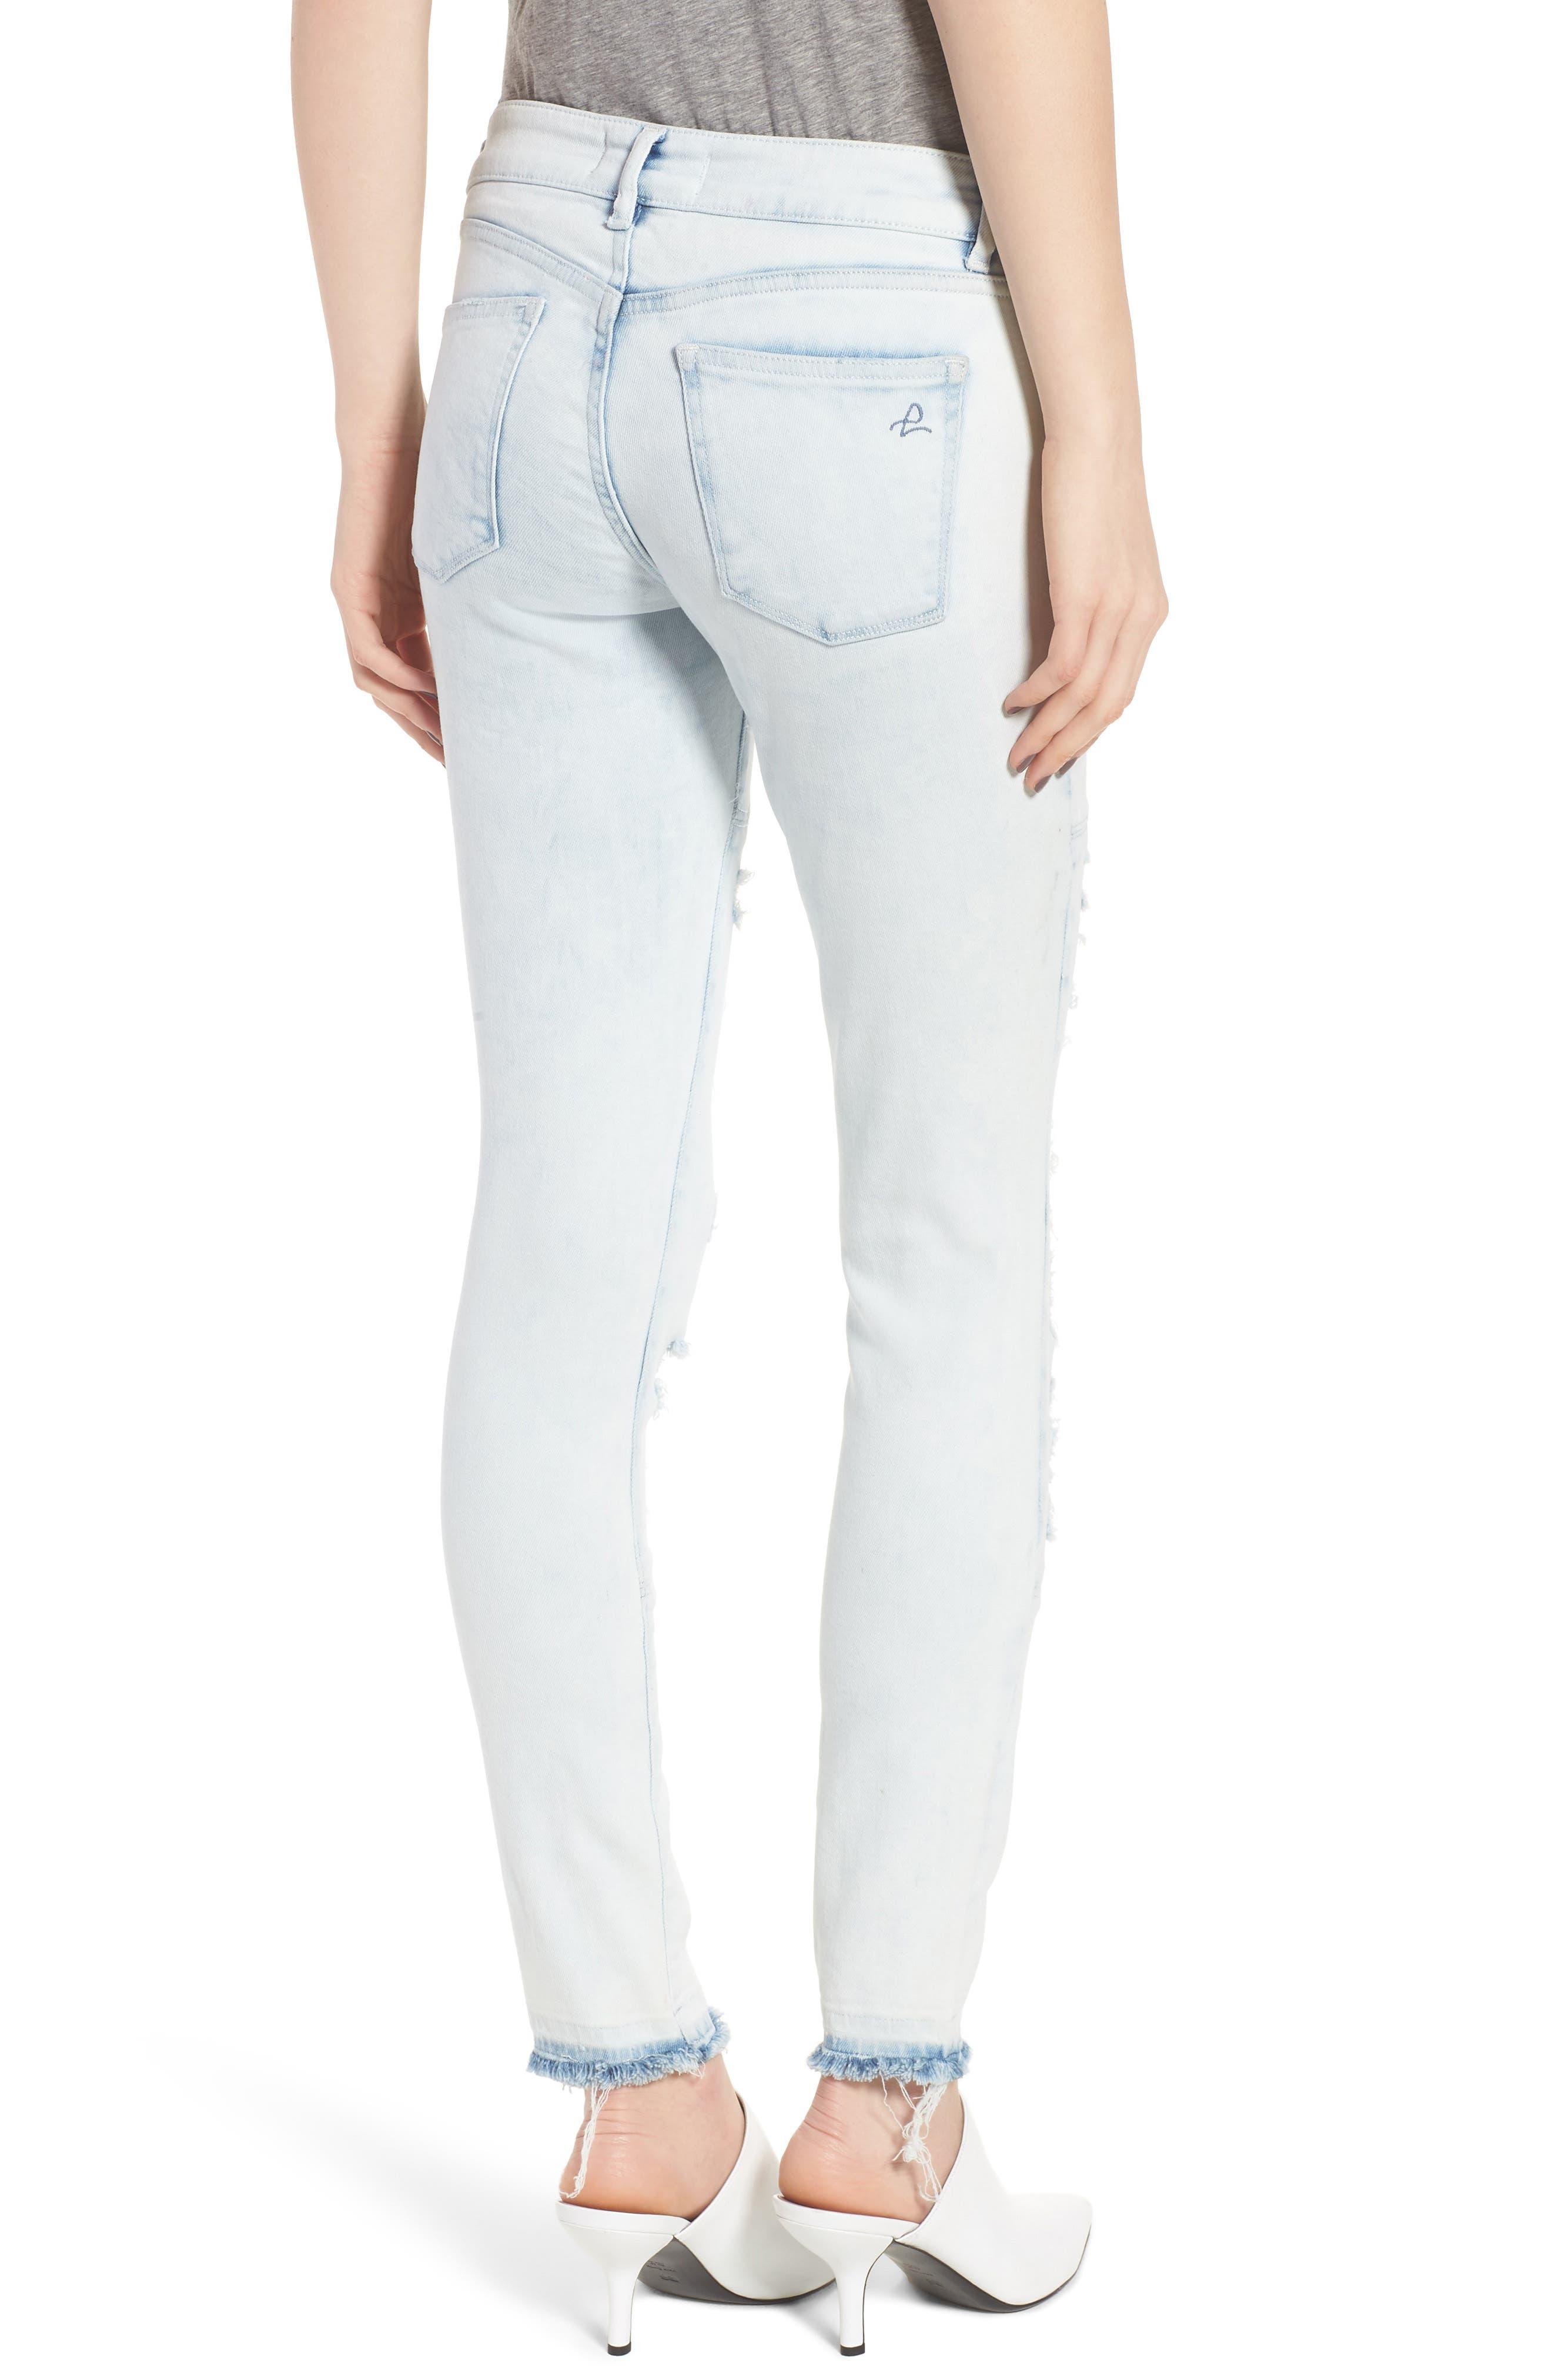 Emma Power Legging Ripped Skinny Jeans,                             Alternate thumbnail 2, color,                             020